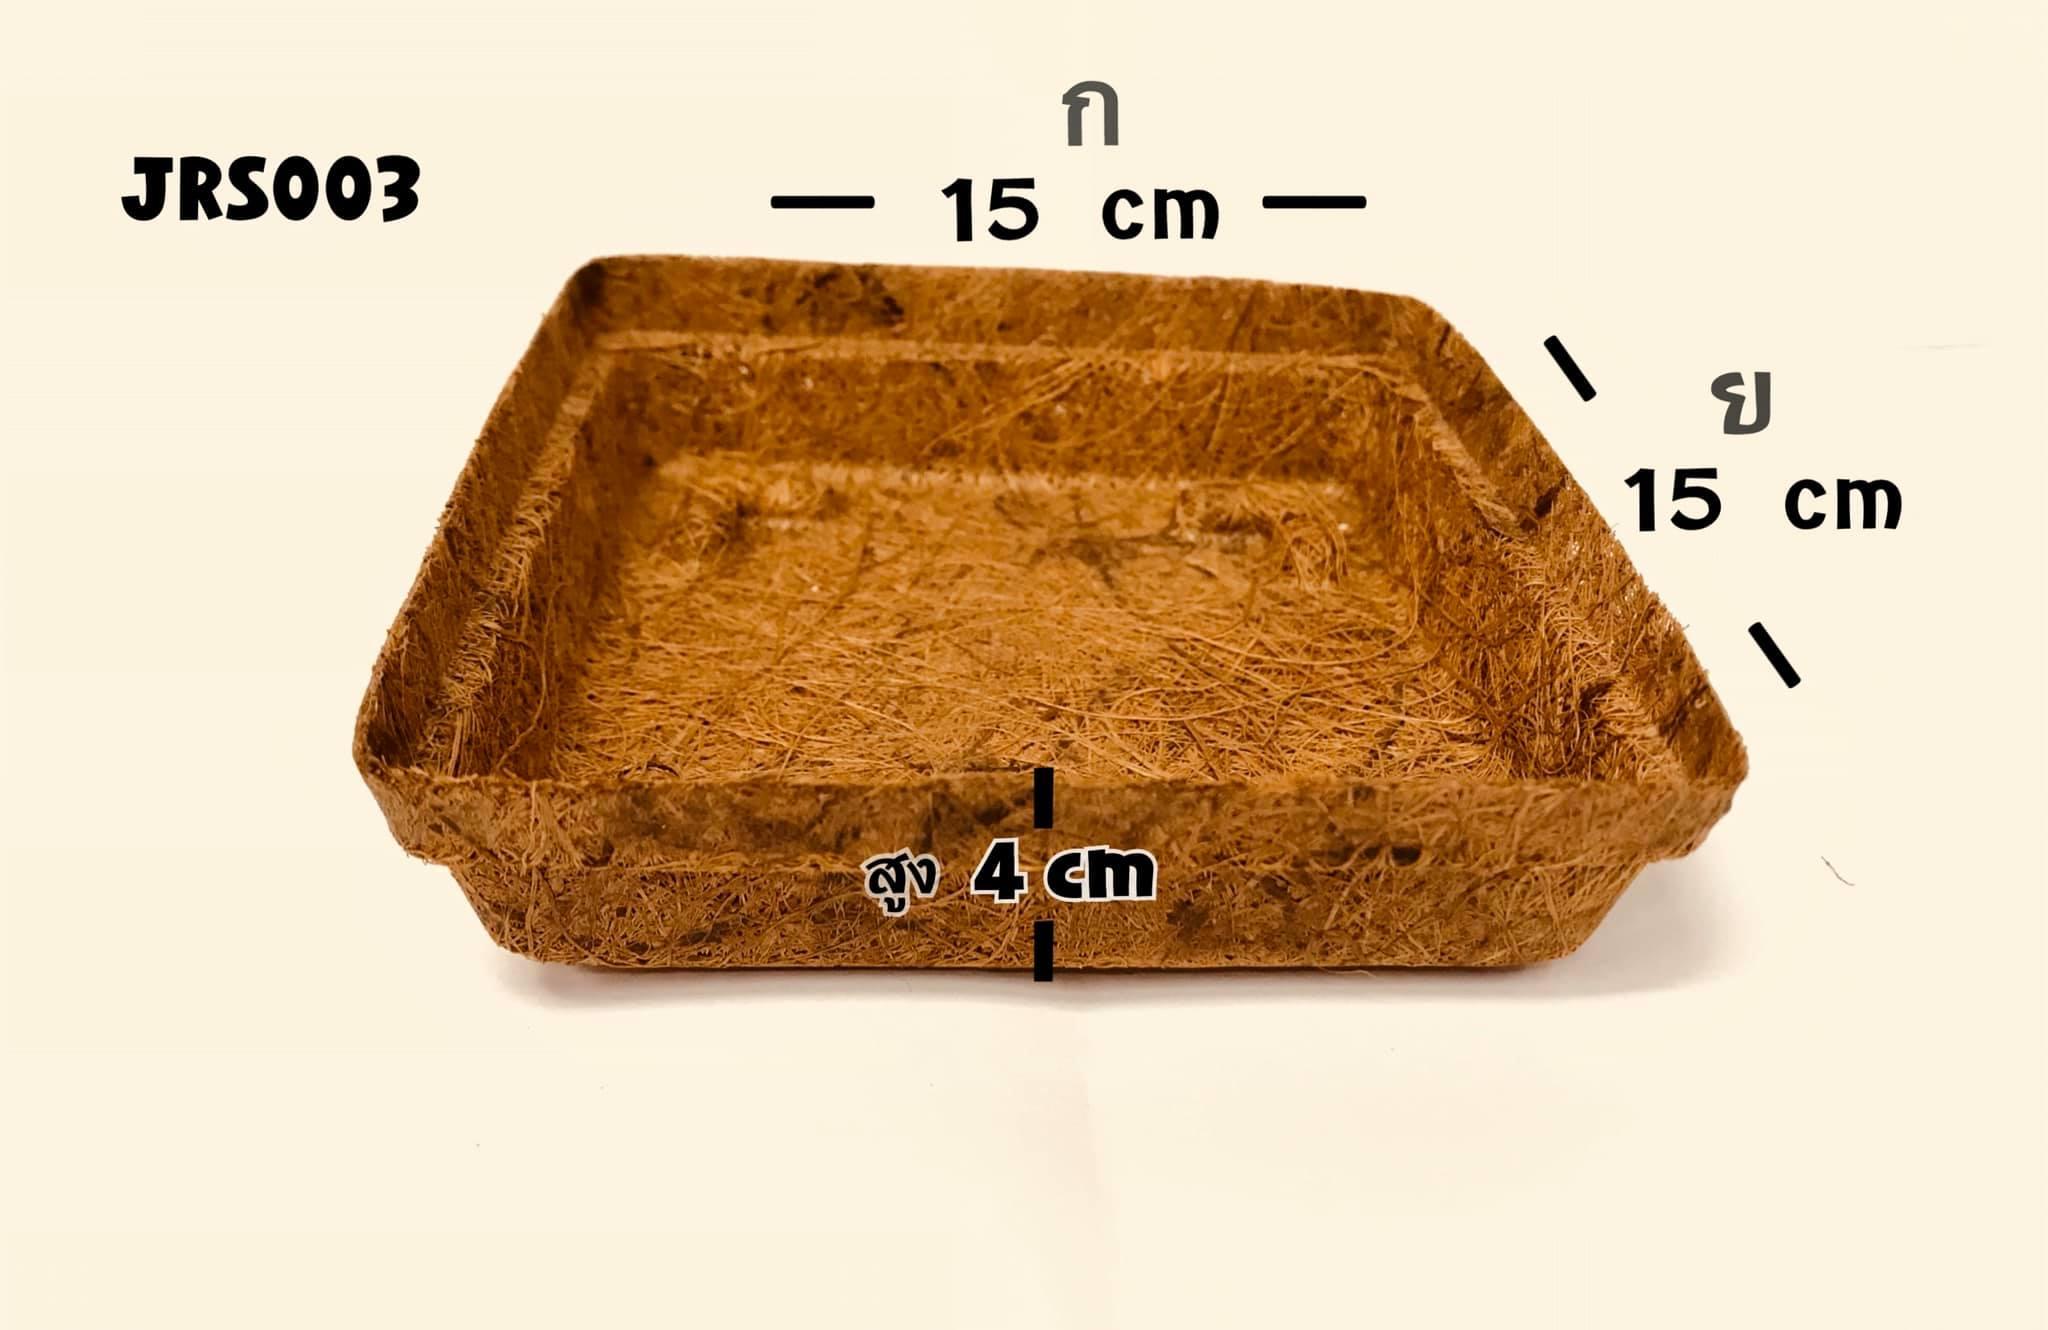 Biodegradable pots with lids